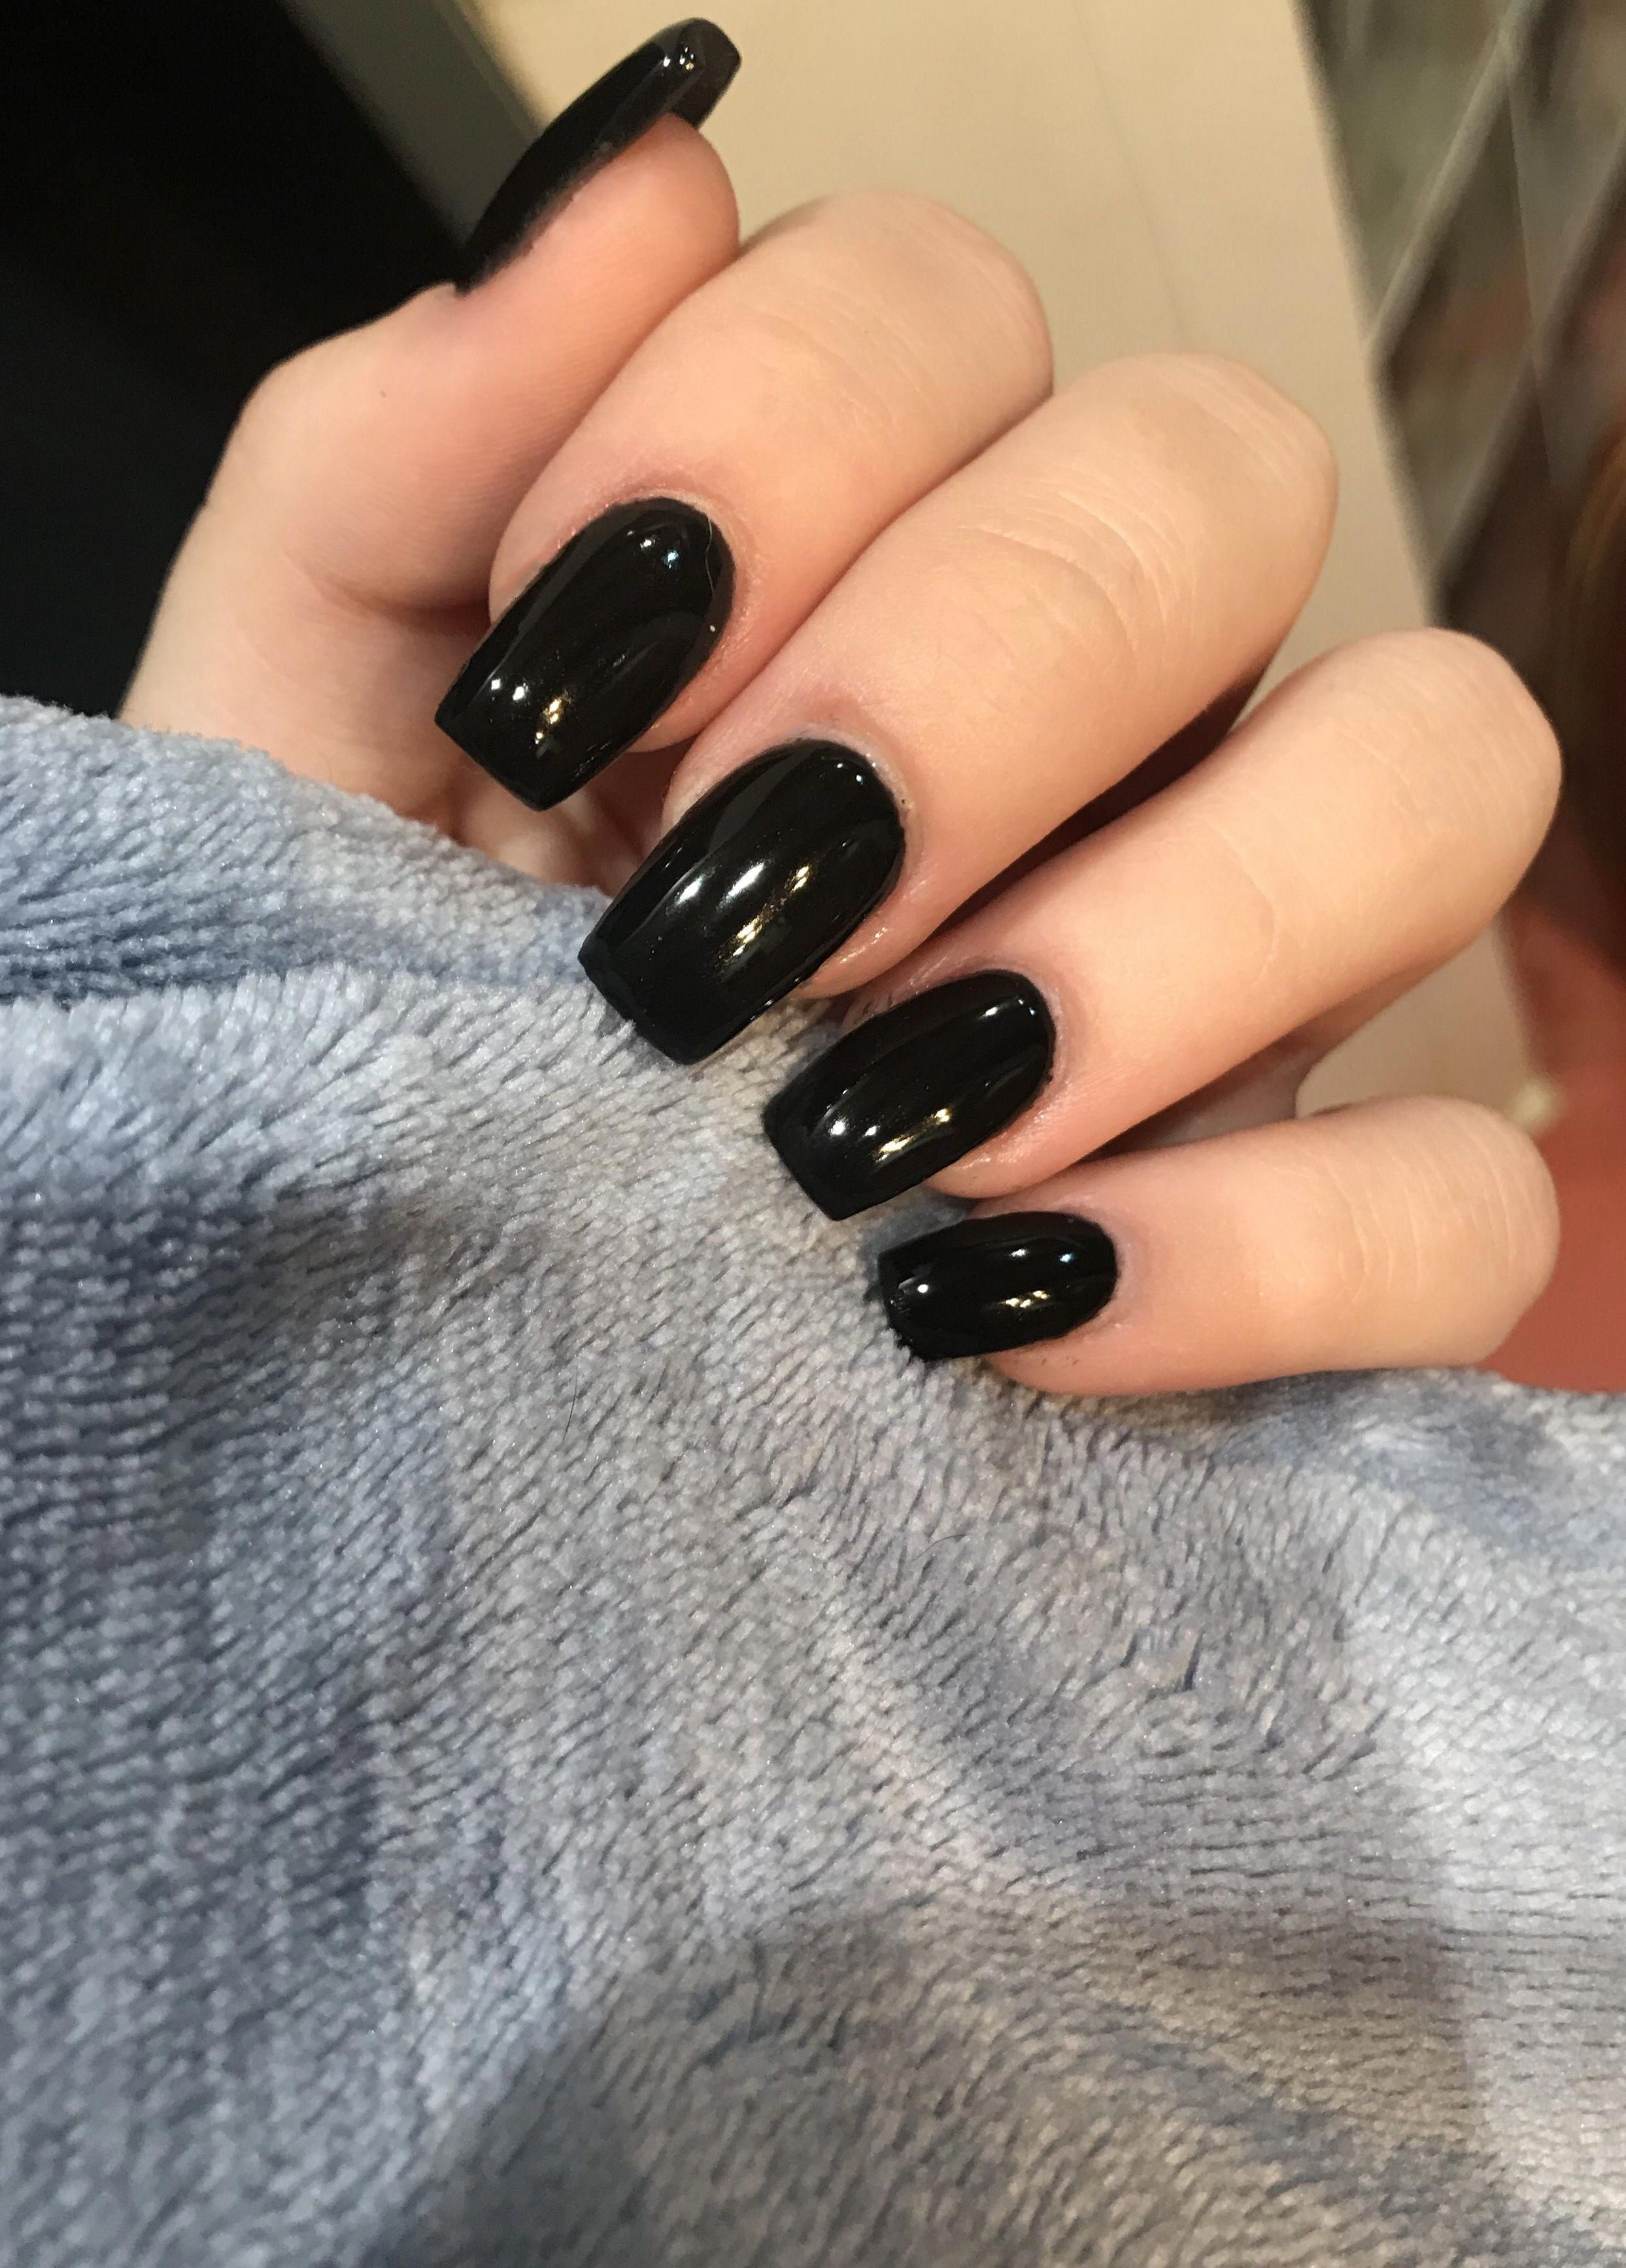 Nails Black Blacknails Love Shortnaildesigns Square Acrylic Nails Short Acrylic Nails Black Nails